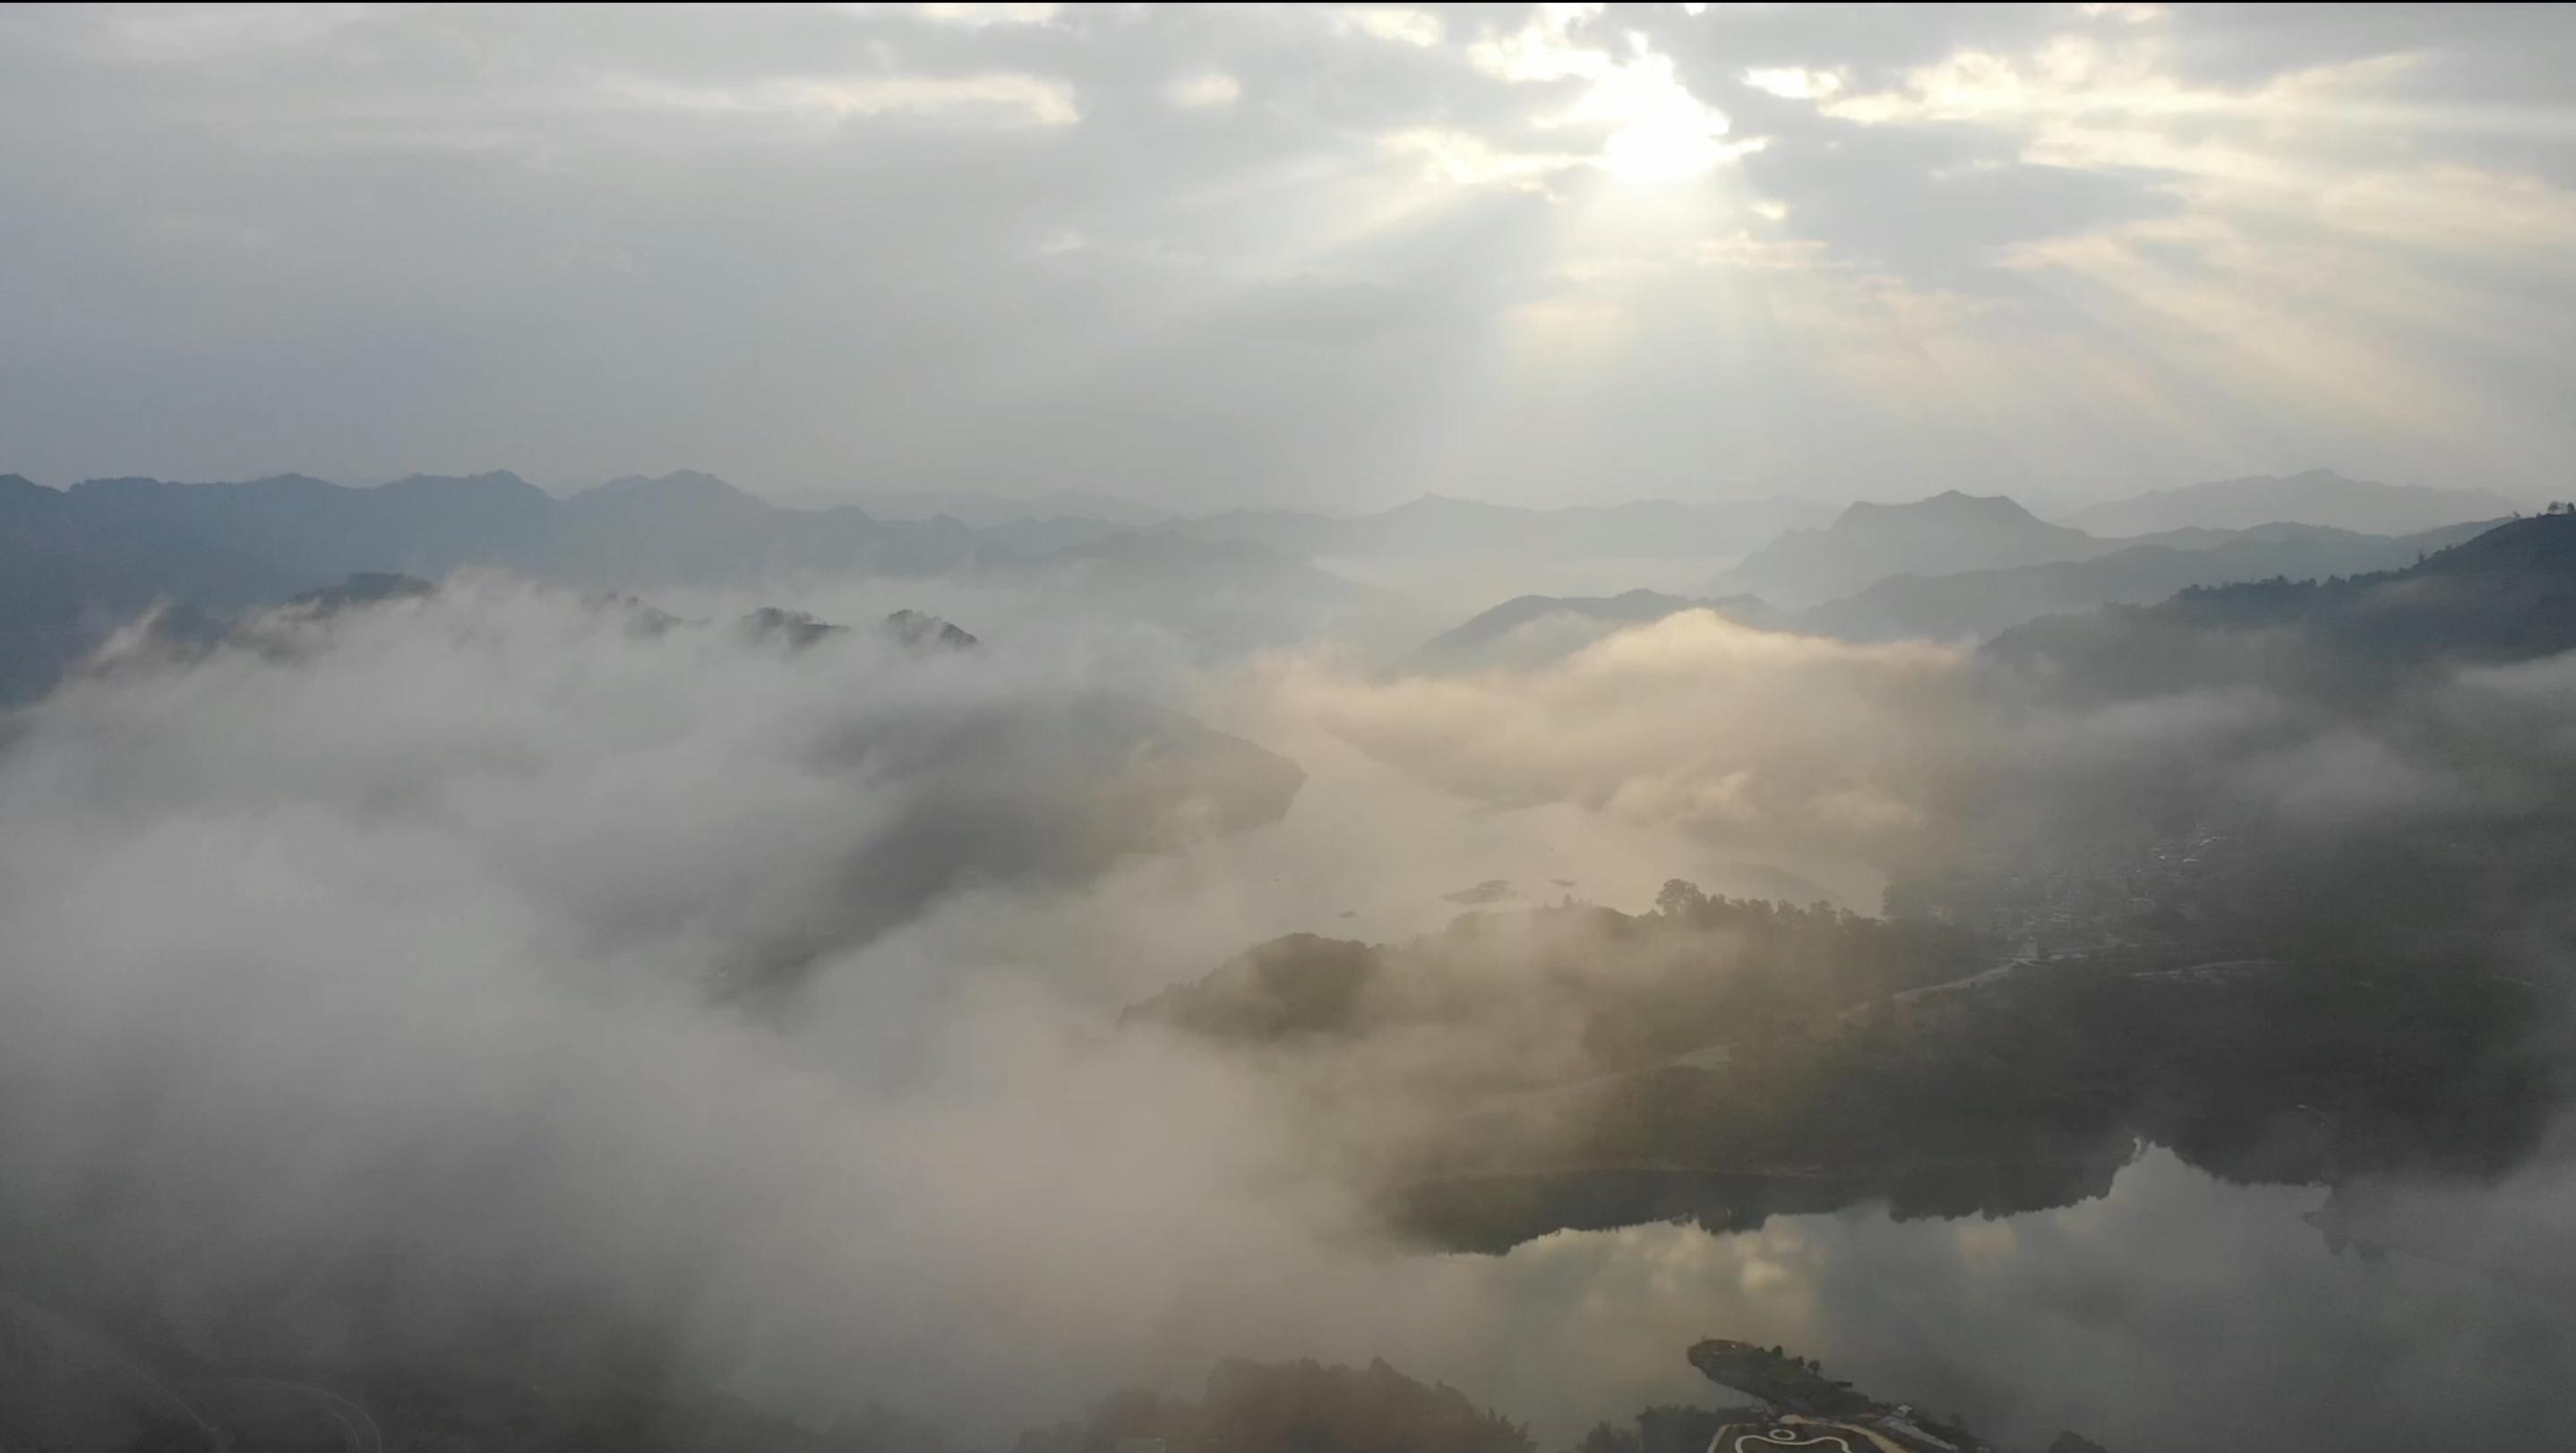 Enjoy views of sun over mountain mist